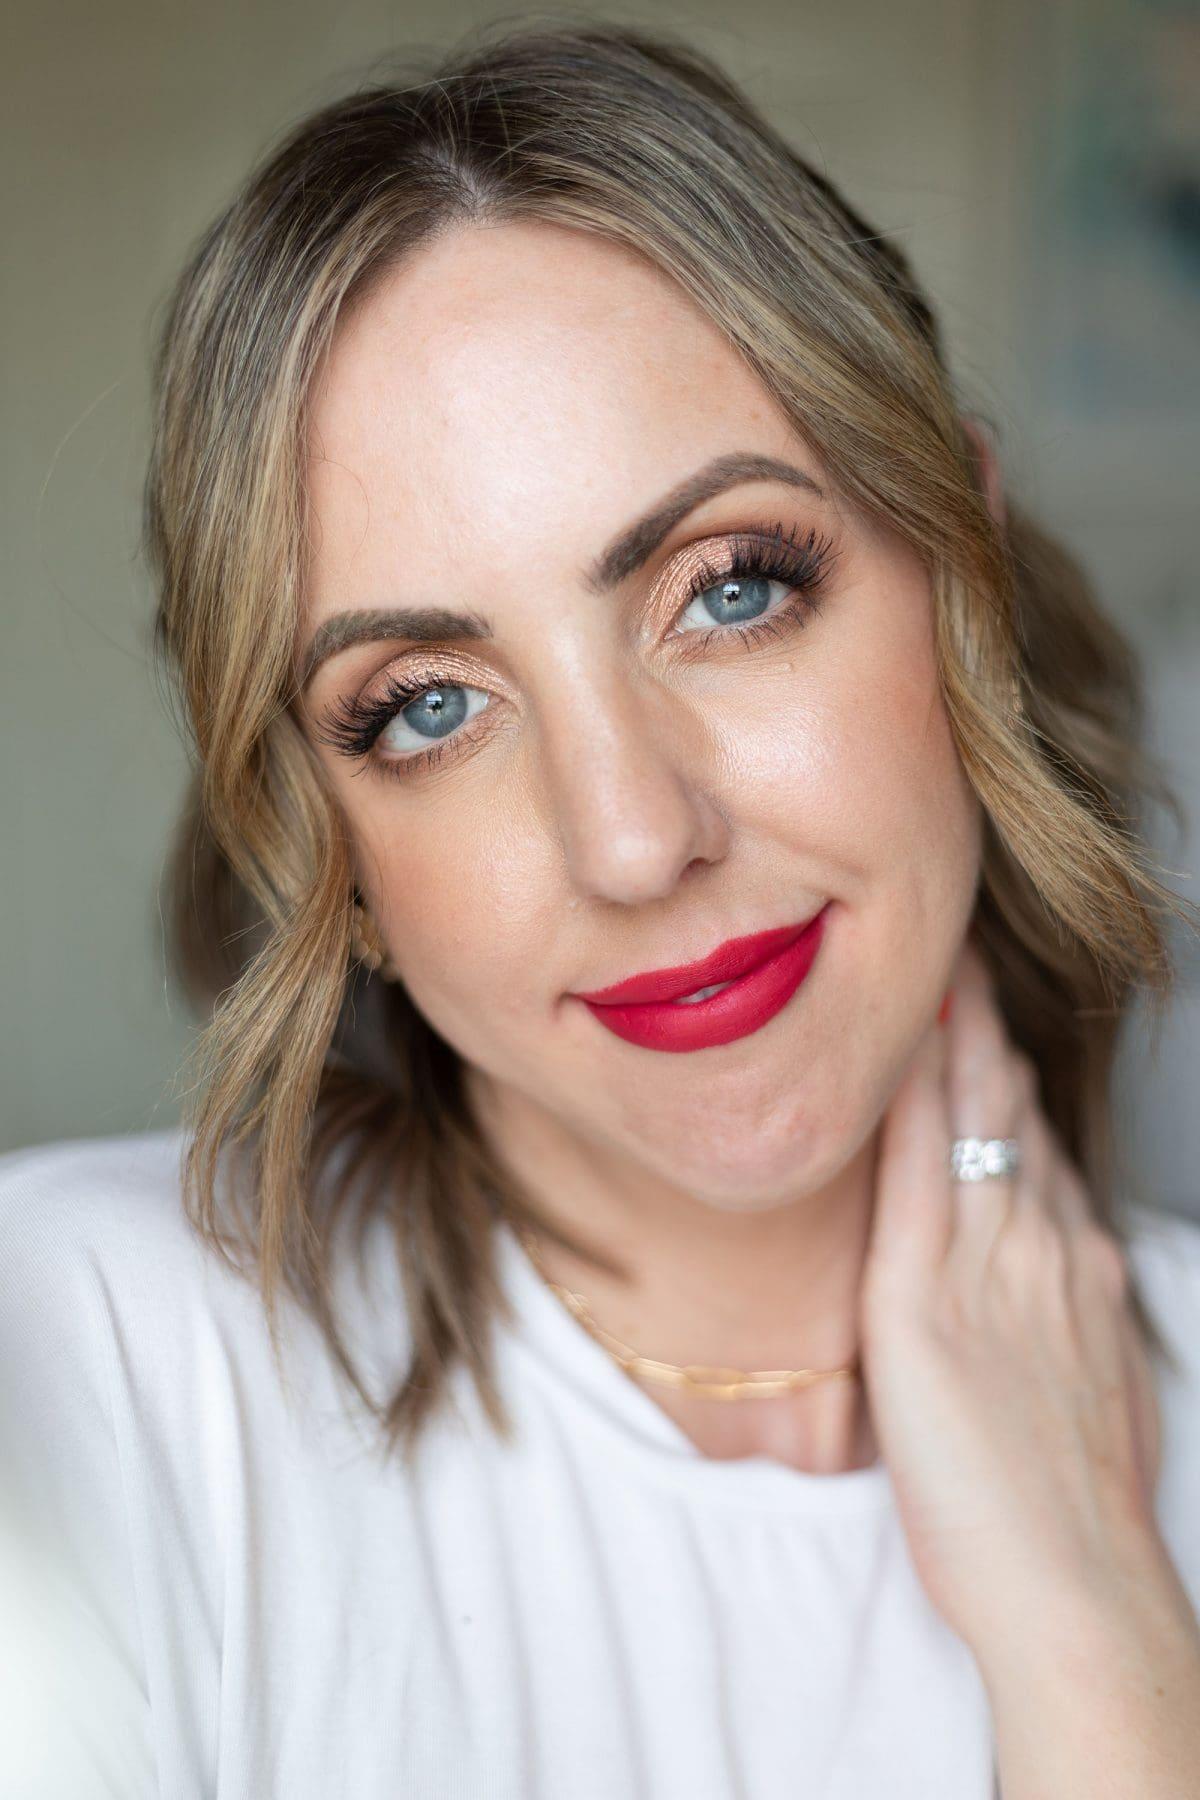 Maybelline Ultimatte Slim Lipstick in More Magenta lip swatch